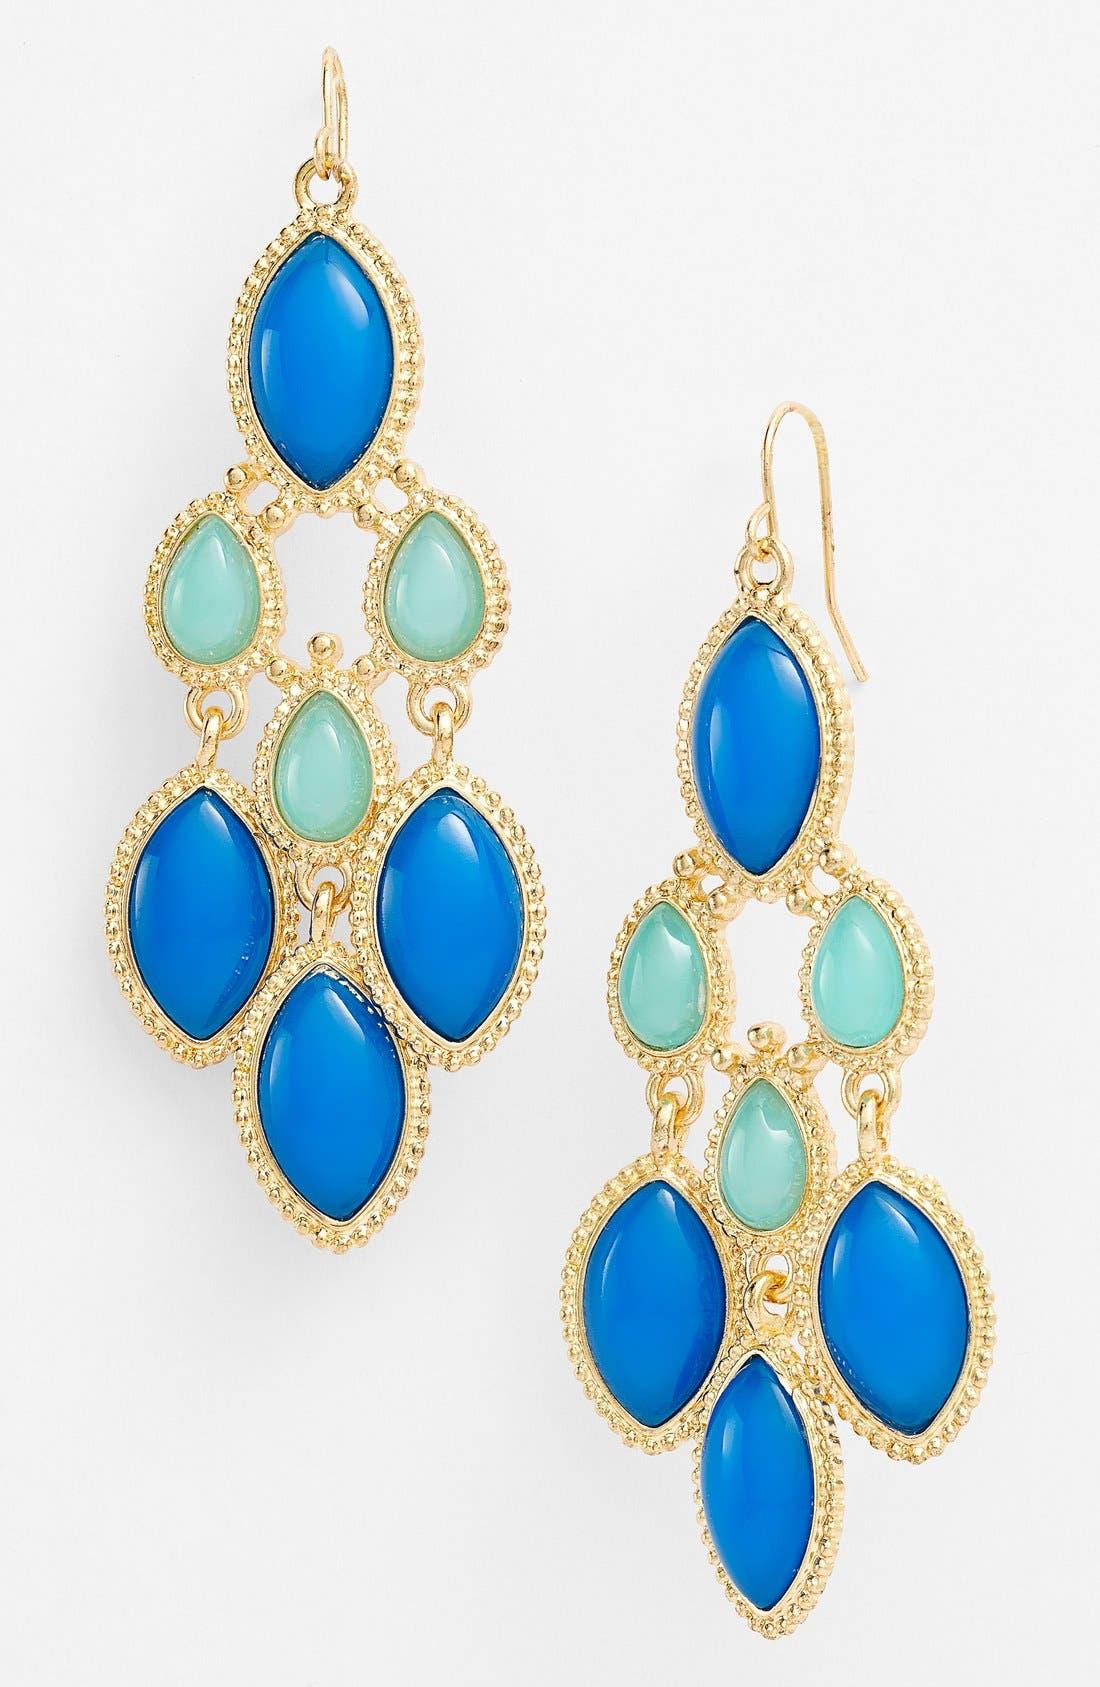 Main Image - Tasha Chandelier Earrings